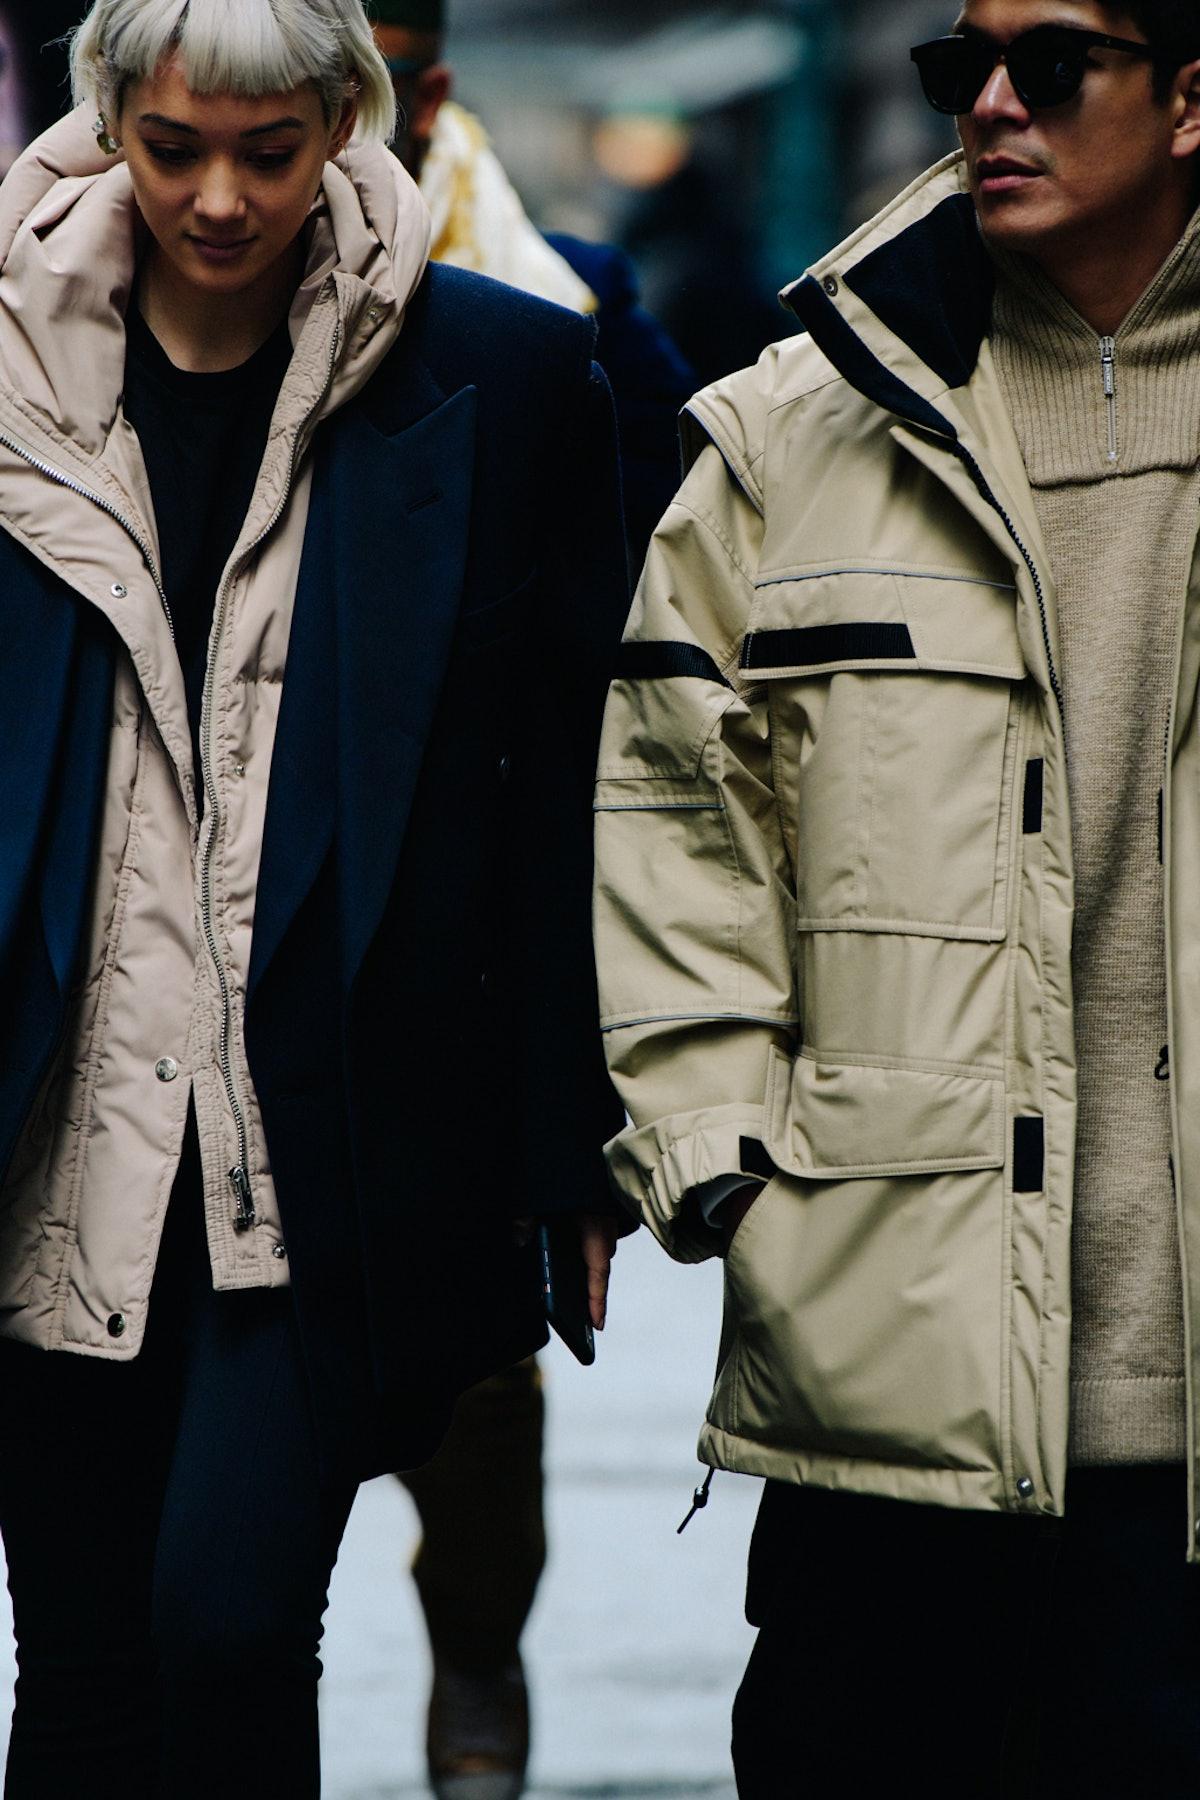 Adam-Katz-Sinding-W-Magazine-New-York-Fashion-Week-Fall-Winter-2019_AKS9548.jpg